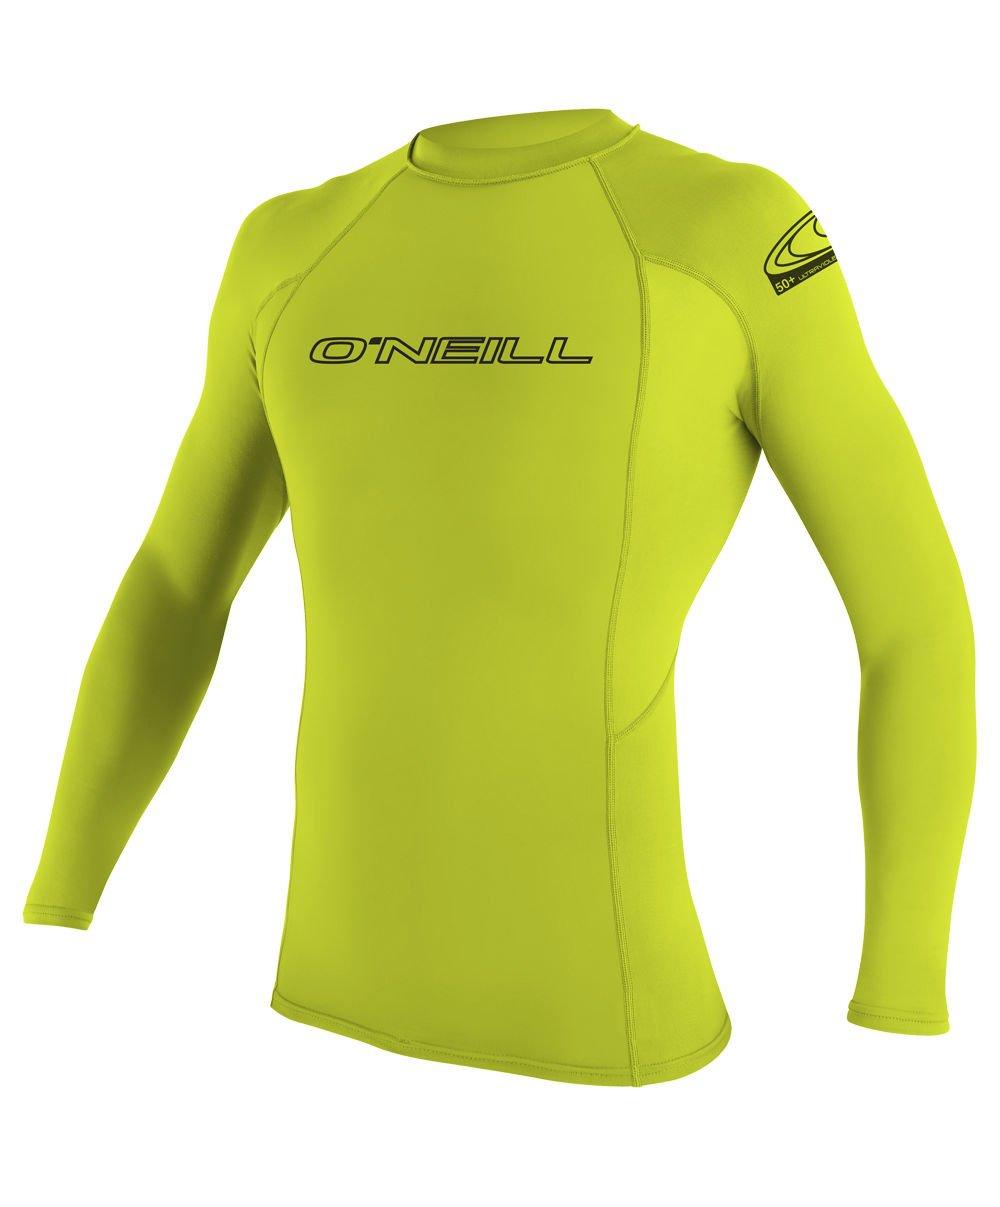 O'Neill Youth Basic Skins UPF 50+ Long Sleeve Rash Guard, Lime, 12